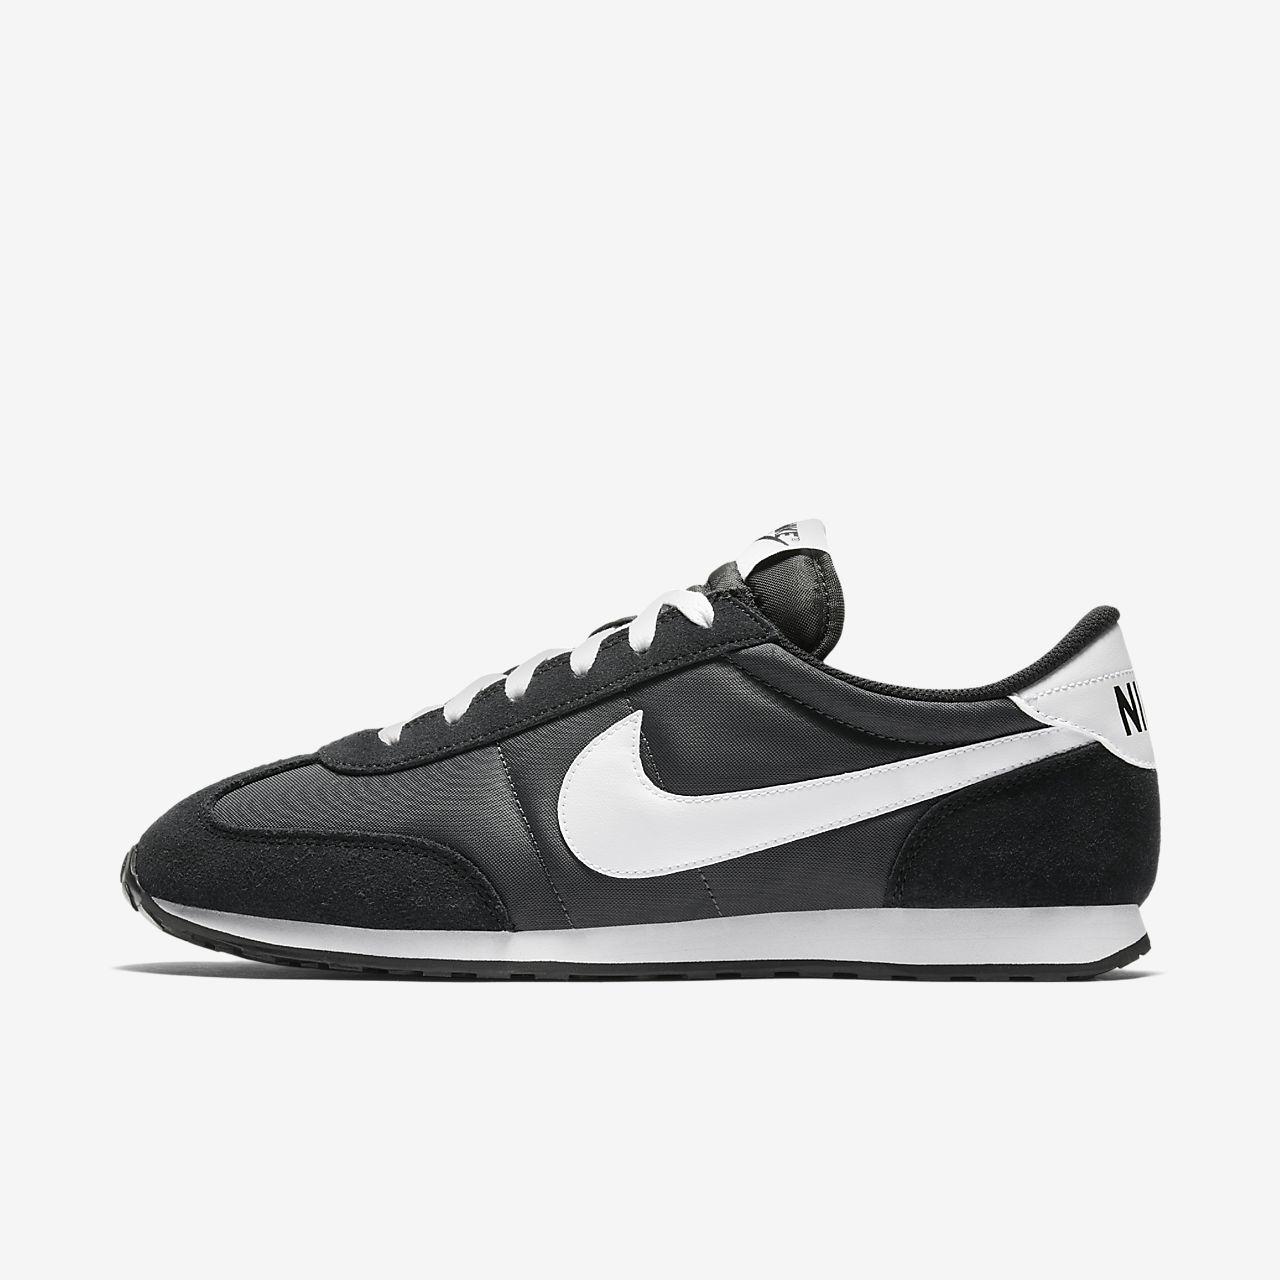 new products d0d32 af1de Low Resolution Nike Mach Runner Herenschoen Nike Mach Runner Herenschoen